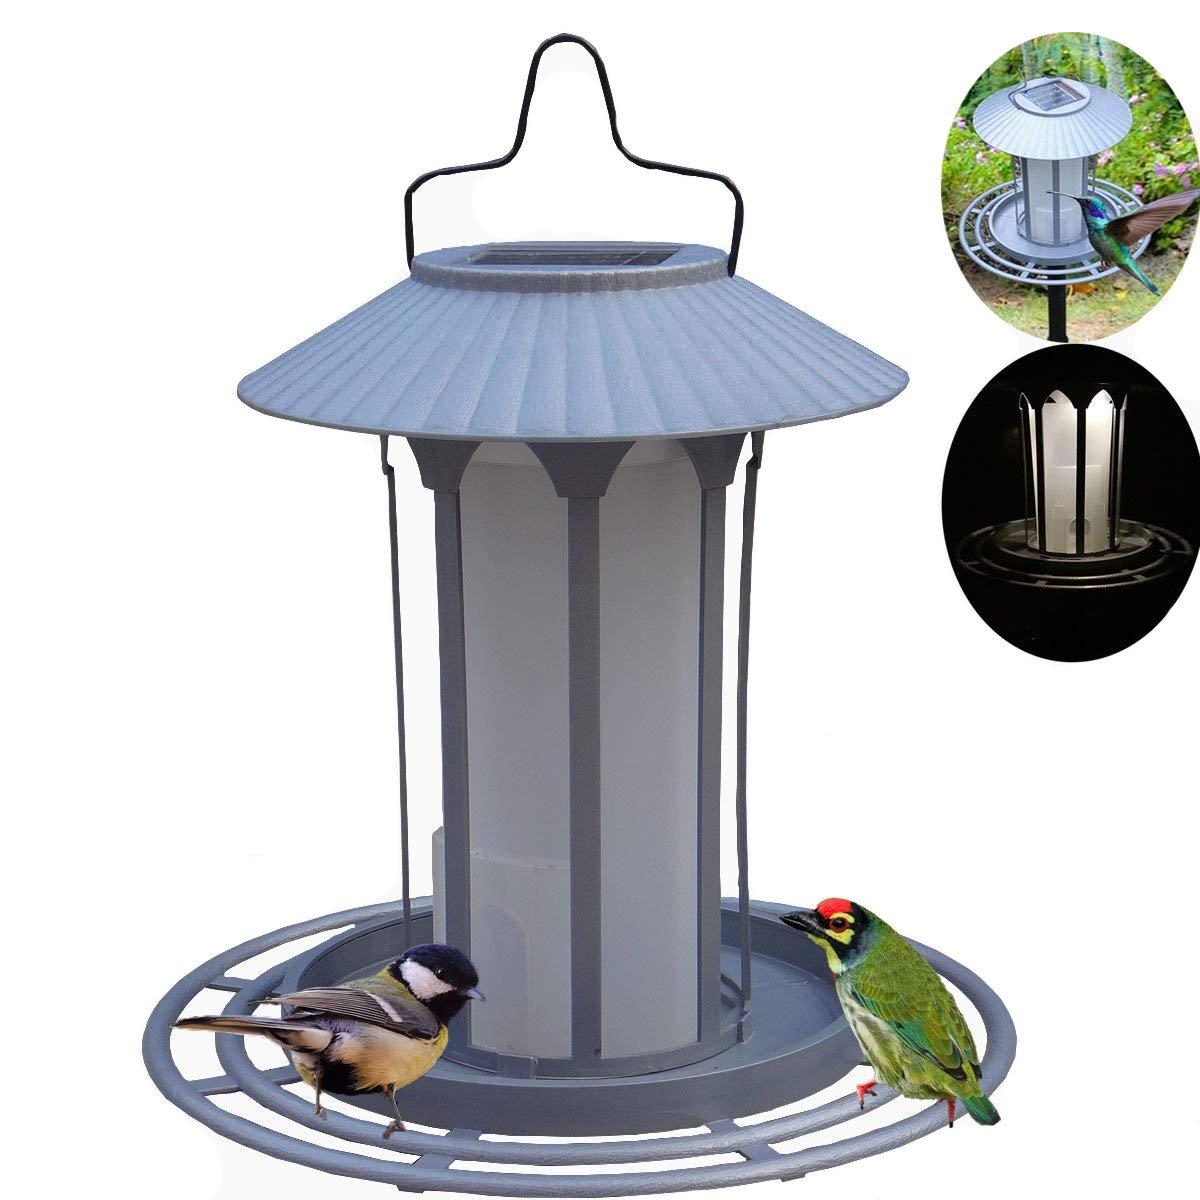 xhope 2 in 1 Bird Feeder,3 led Light Solar Powered Bird Feeder Poles and Hangers Wilderness Lantern for Garden Windows Decration